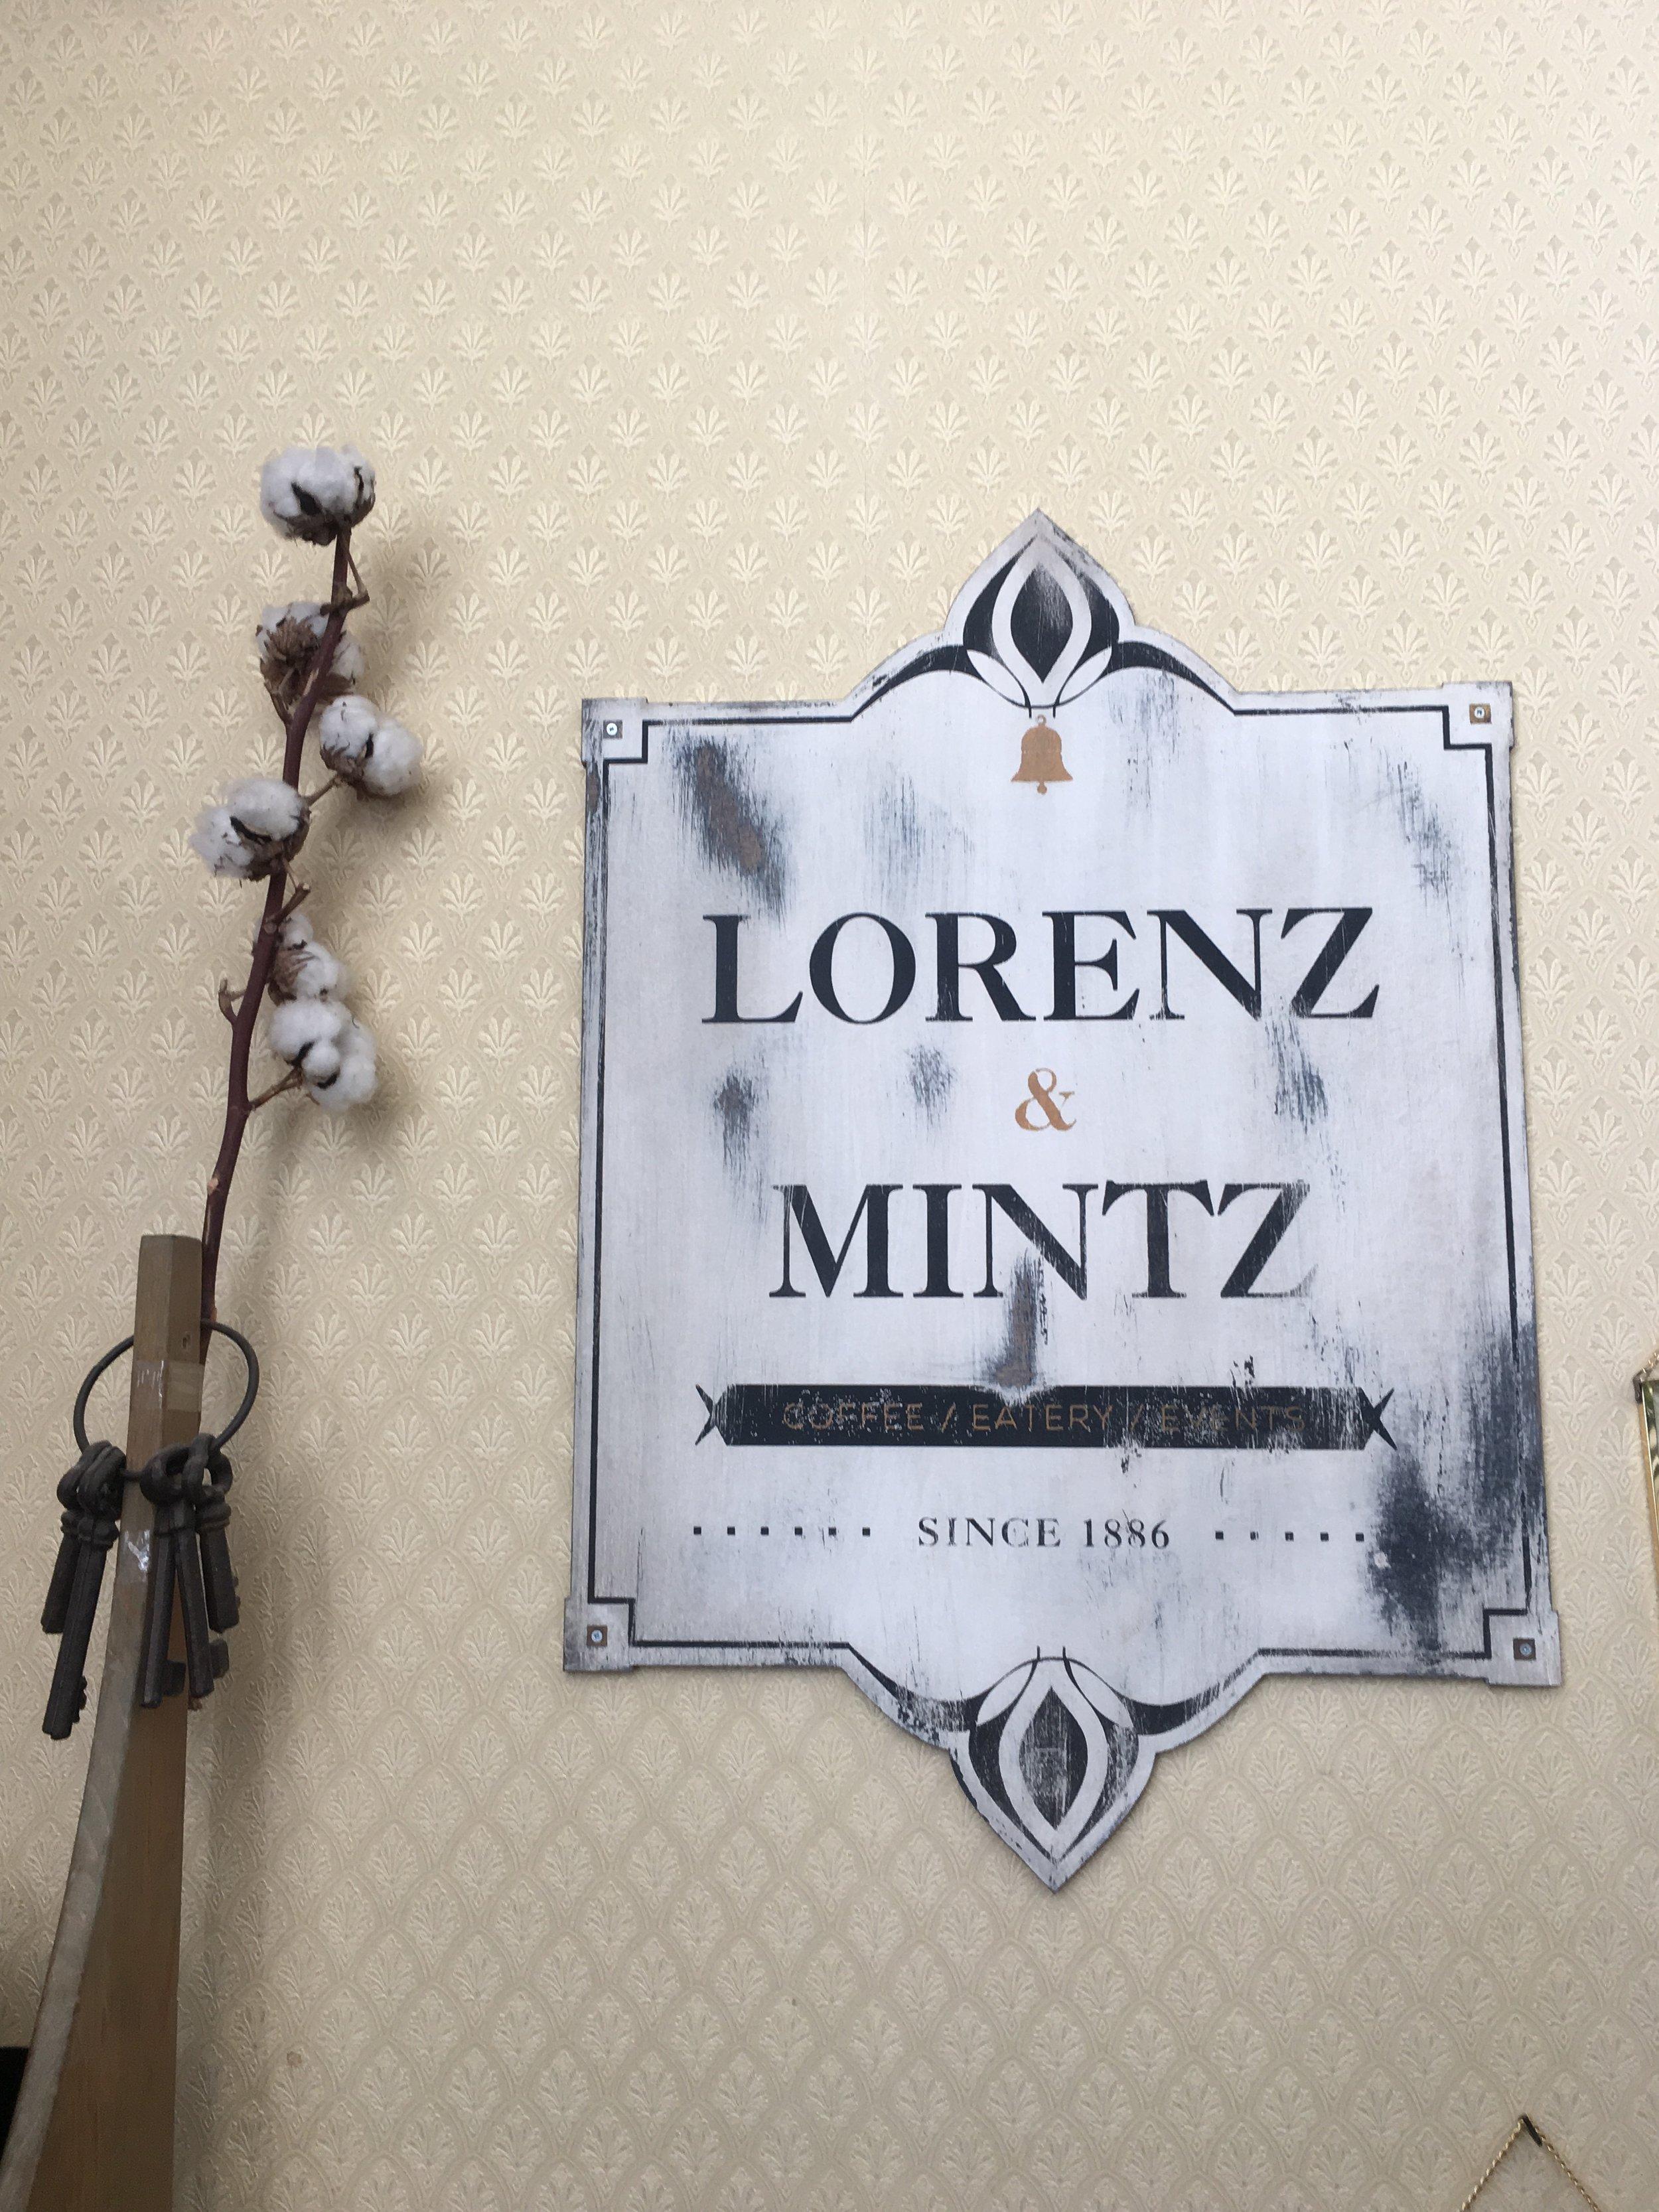 So many pretty details at Lorenz & Mintz in Neve Tzedek.